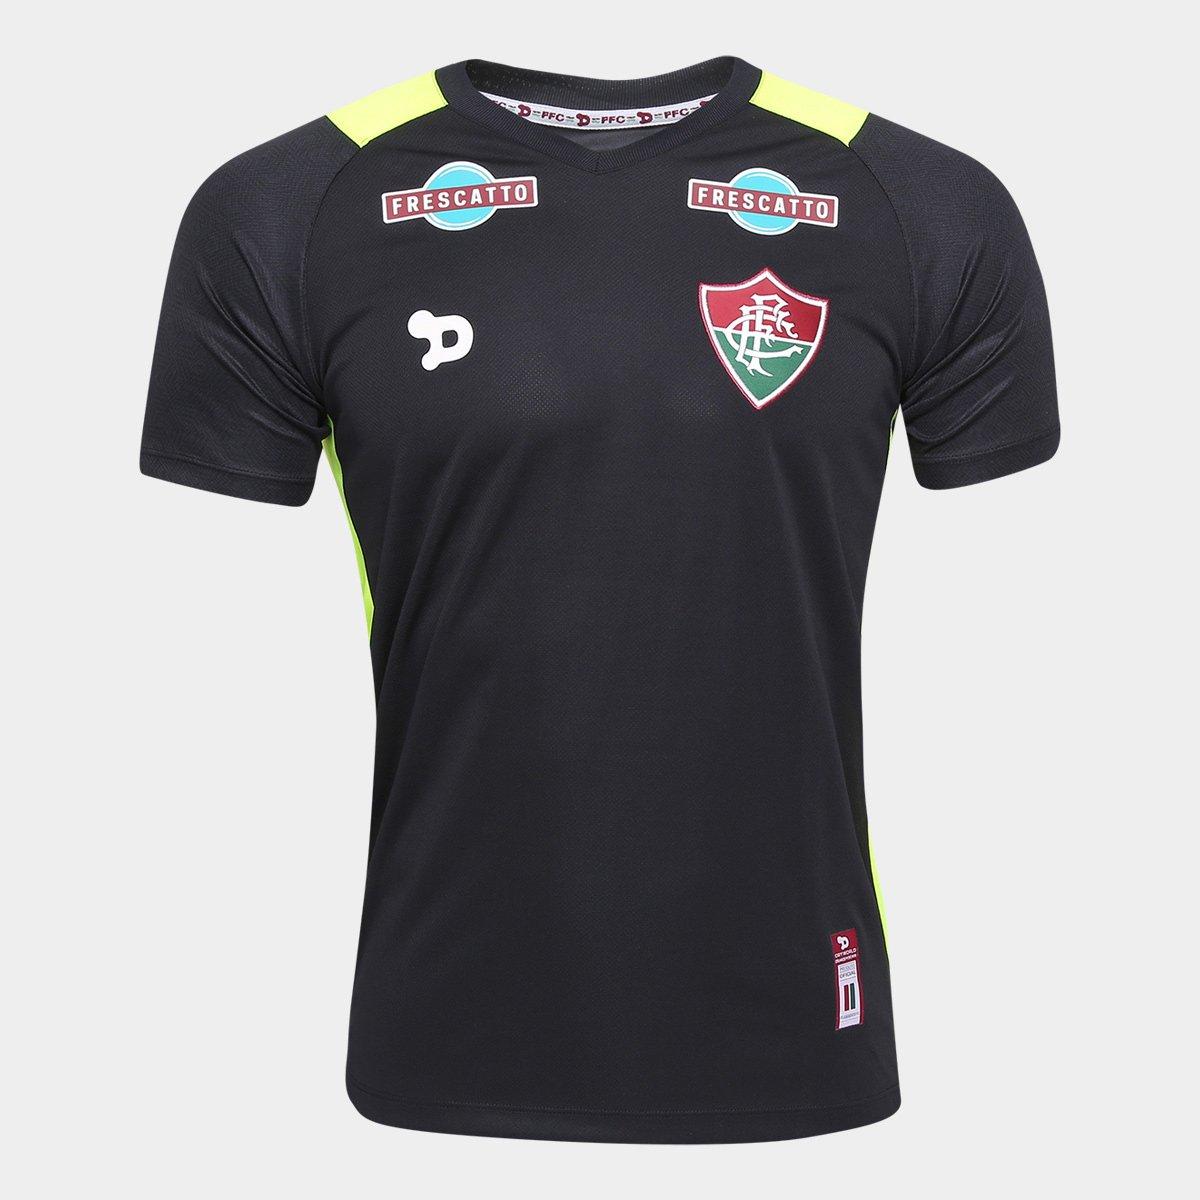 6d46aad9cc6b6 Camisa Fluminense 2016 Goleiro nº 12 - Torcedor Dryworld Masculina - Compre  Agora